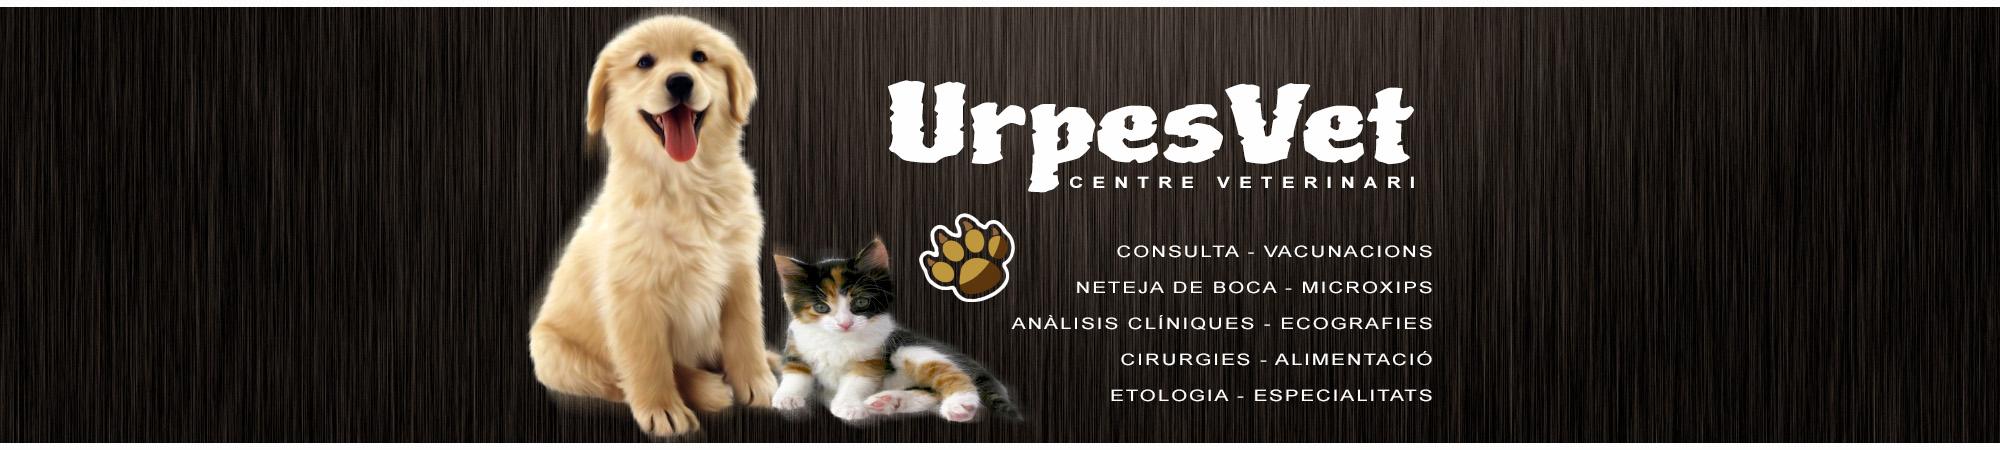 Centro veterinario Baix Llobregat, Centro veterinario Sant Joan Despí